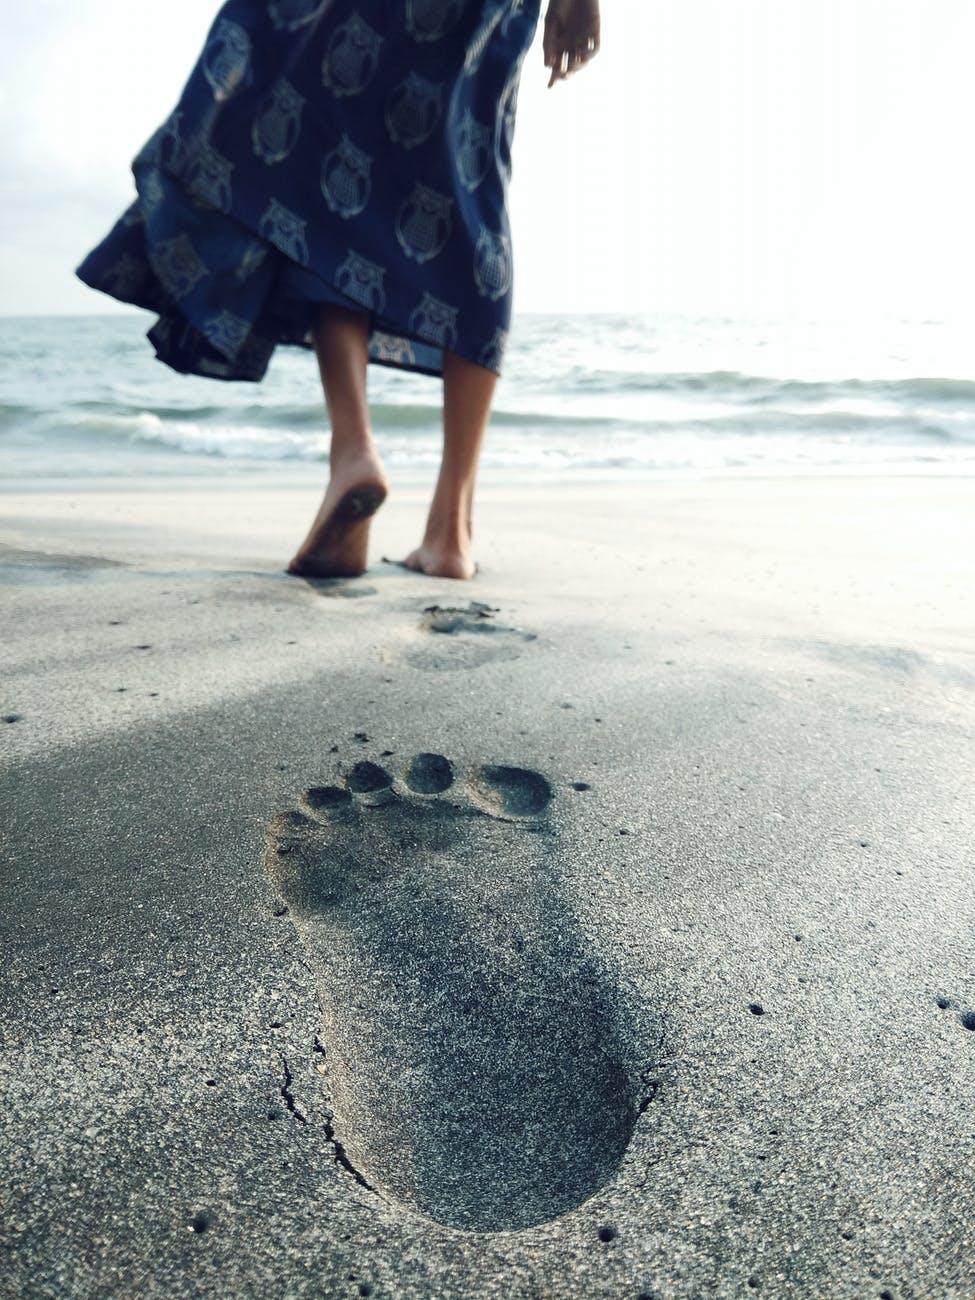 photo of woman walking barefoot on seashore